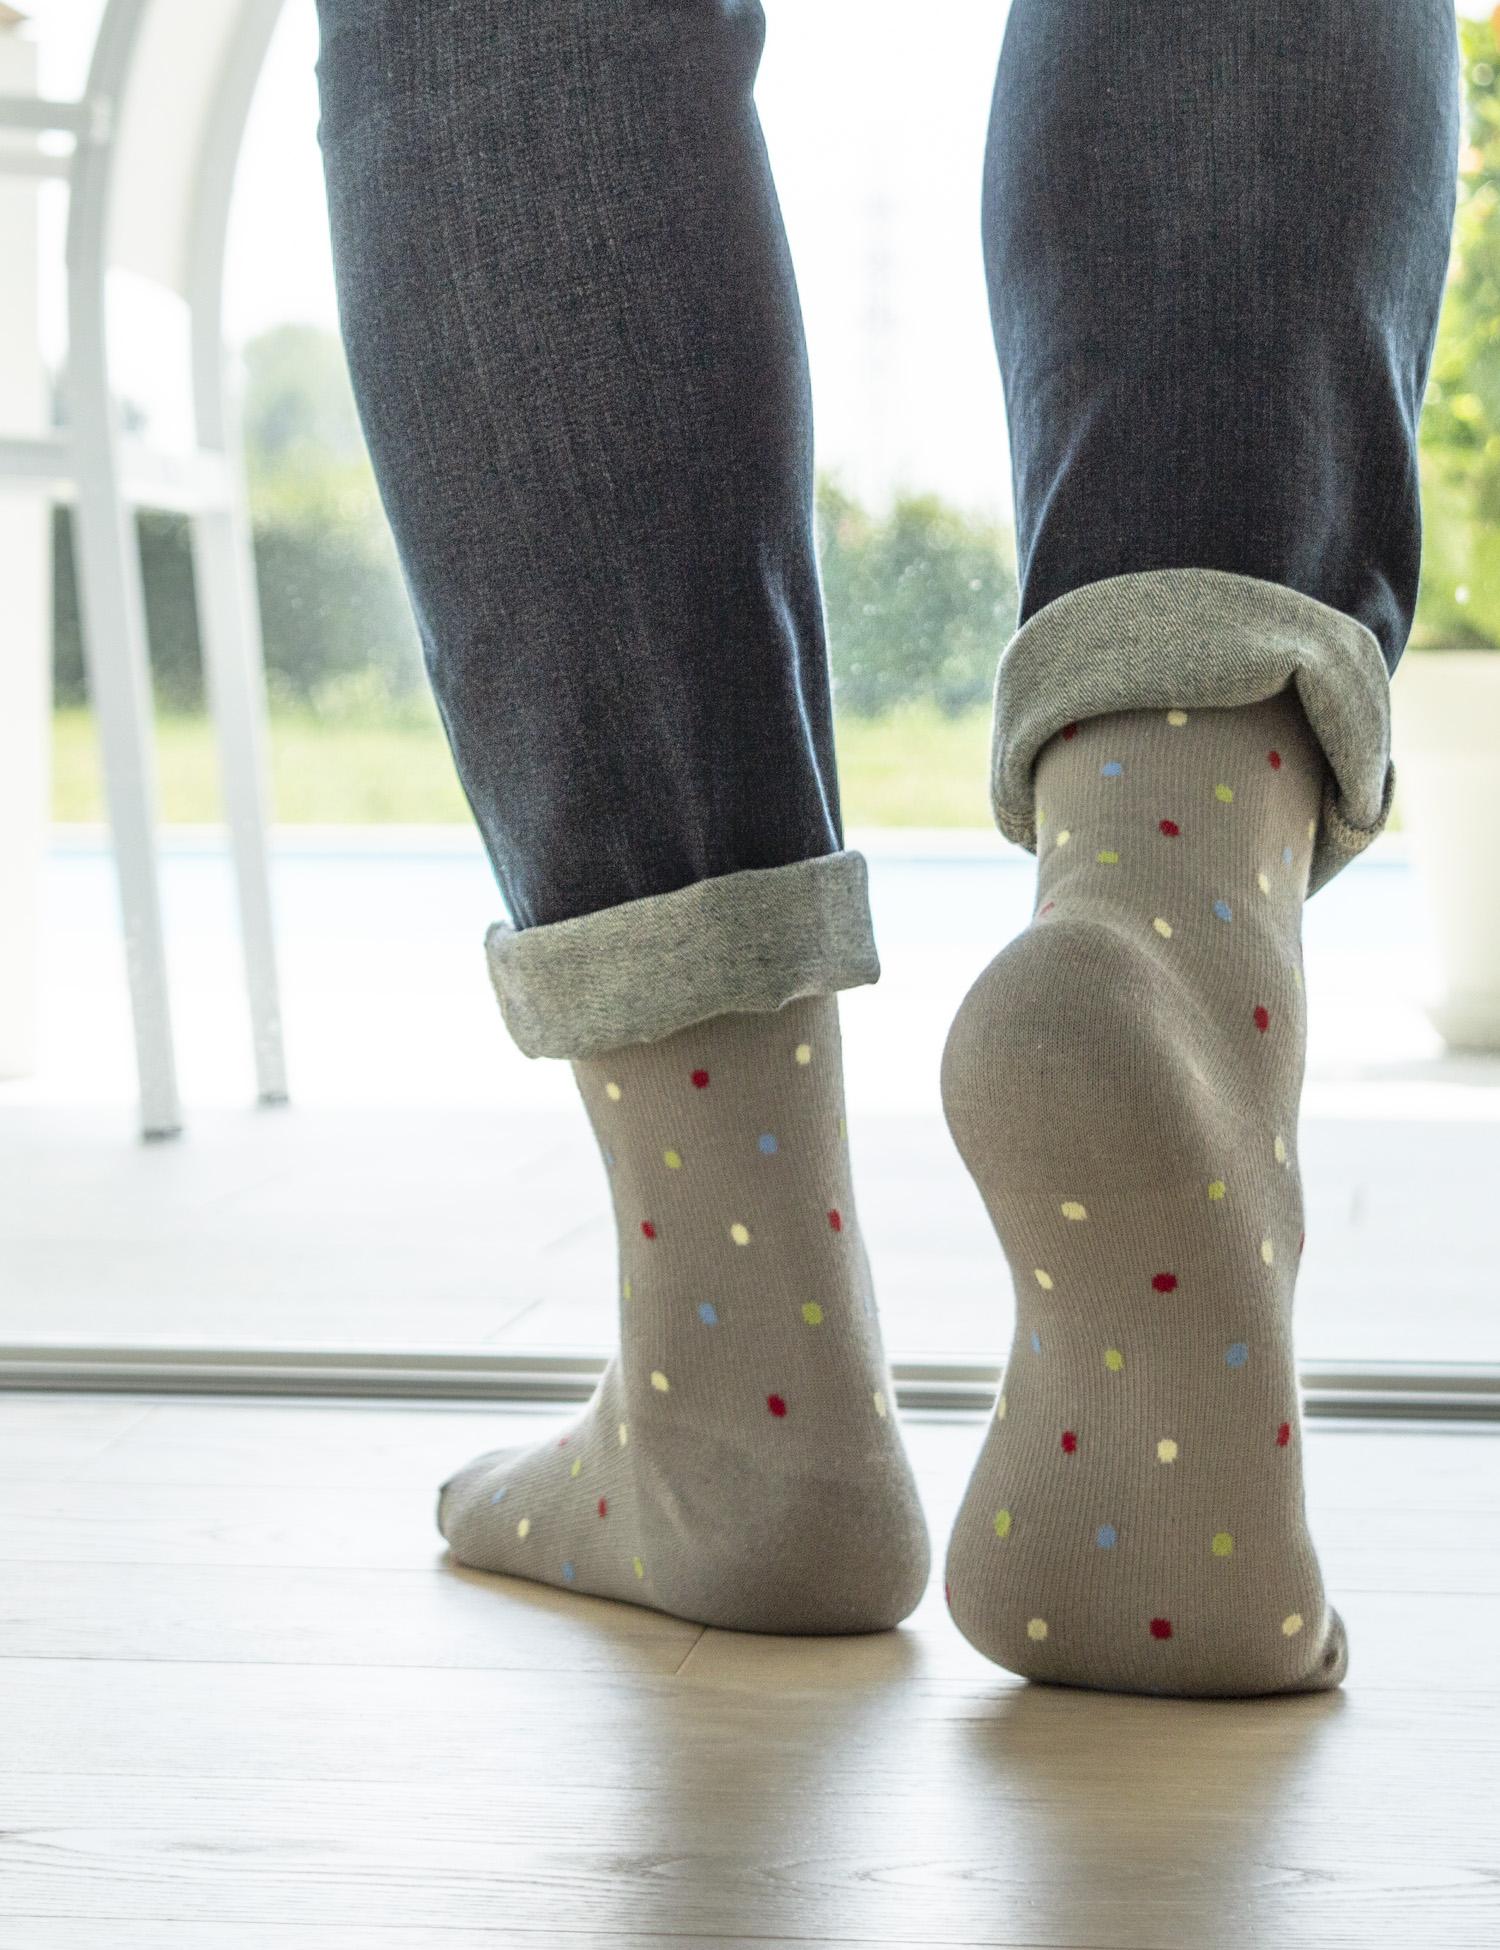 fancy-socks_01-pois-031-cenere_6